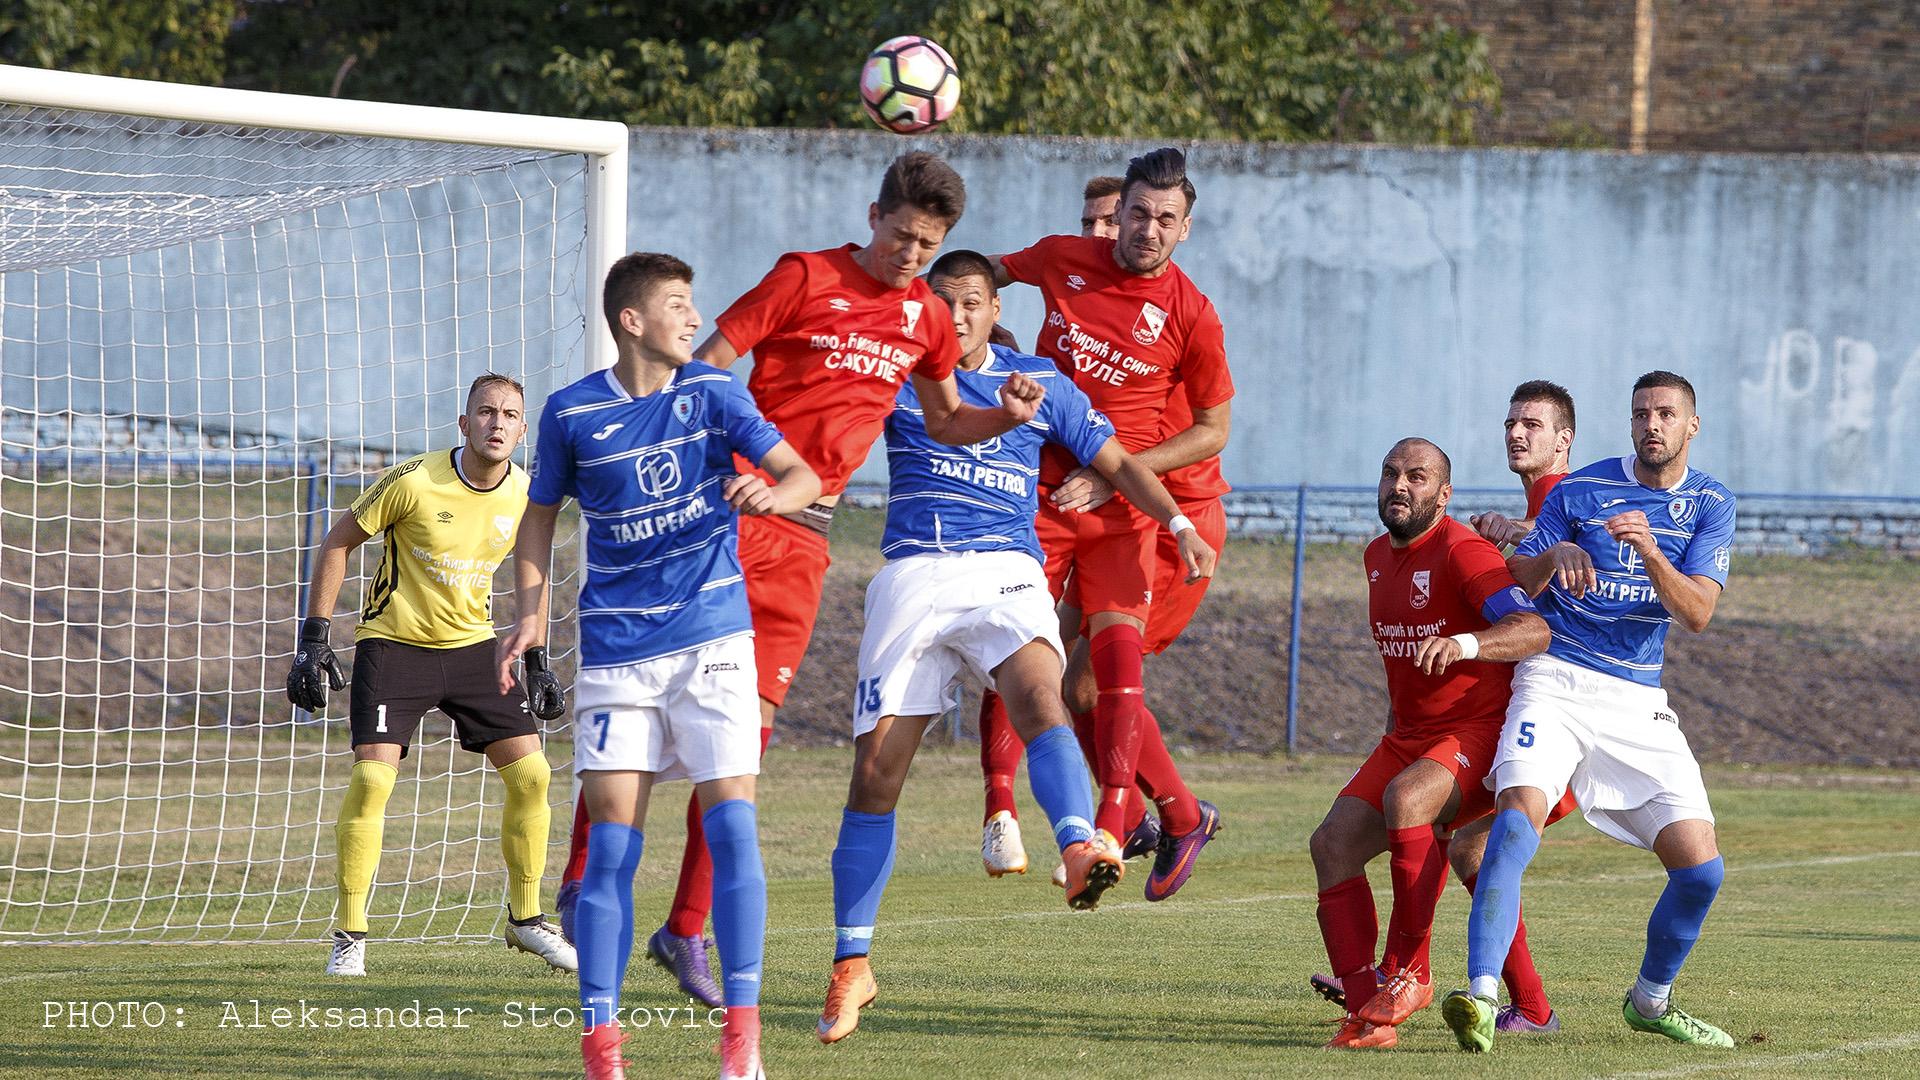 Dinamo Pančevo - Borac Sakule